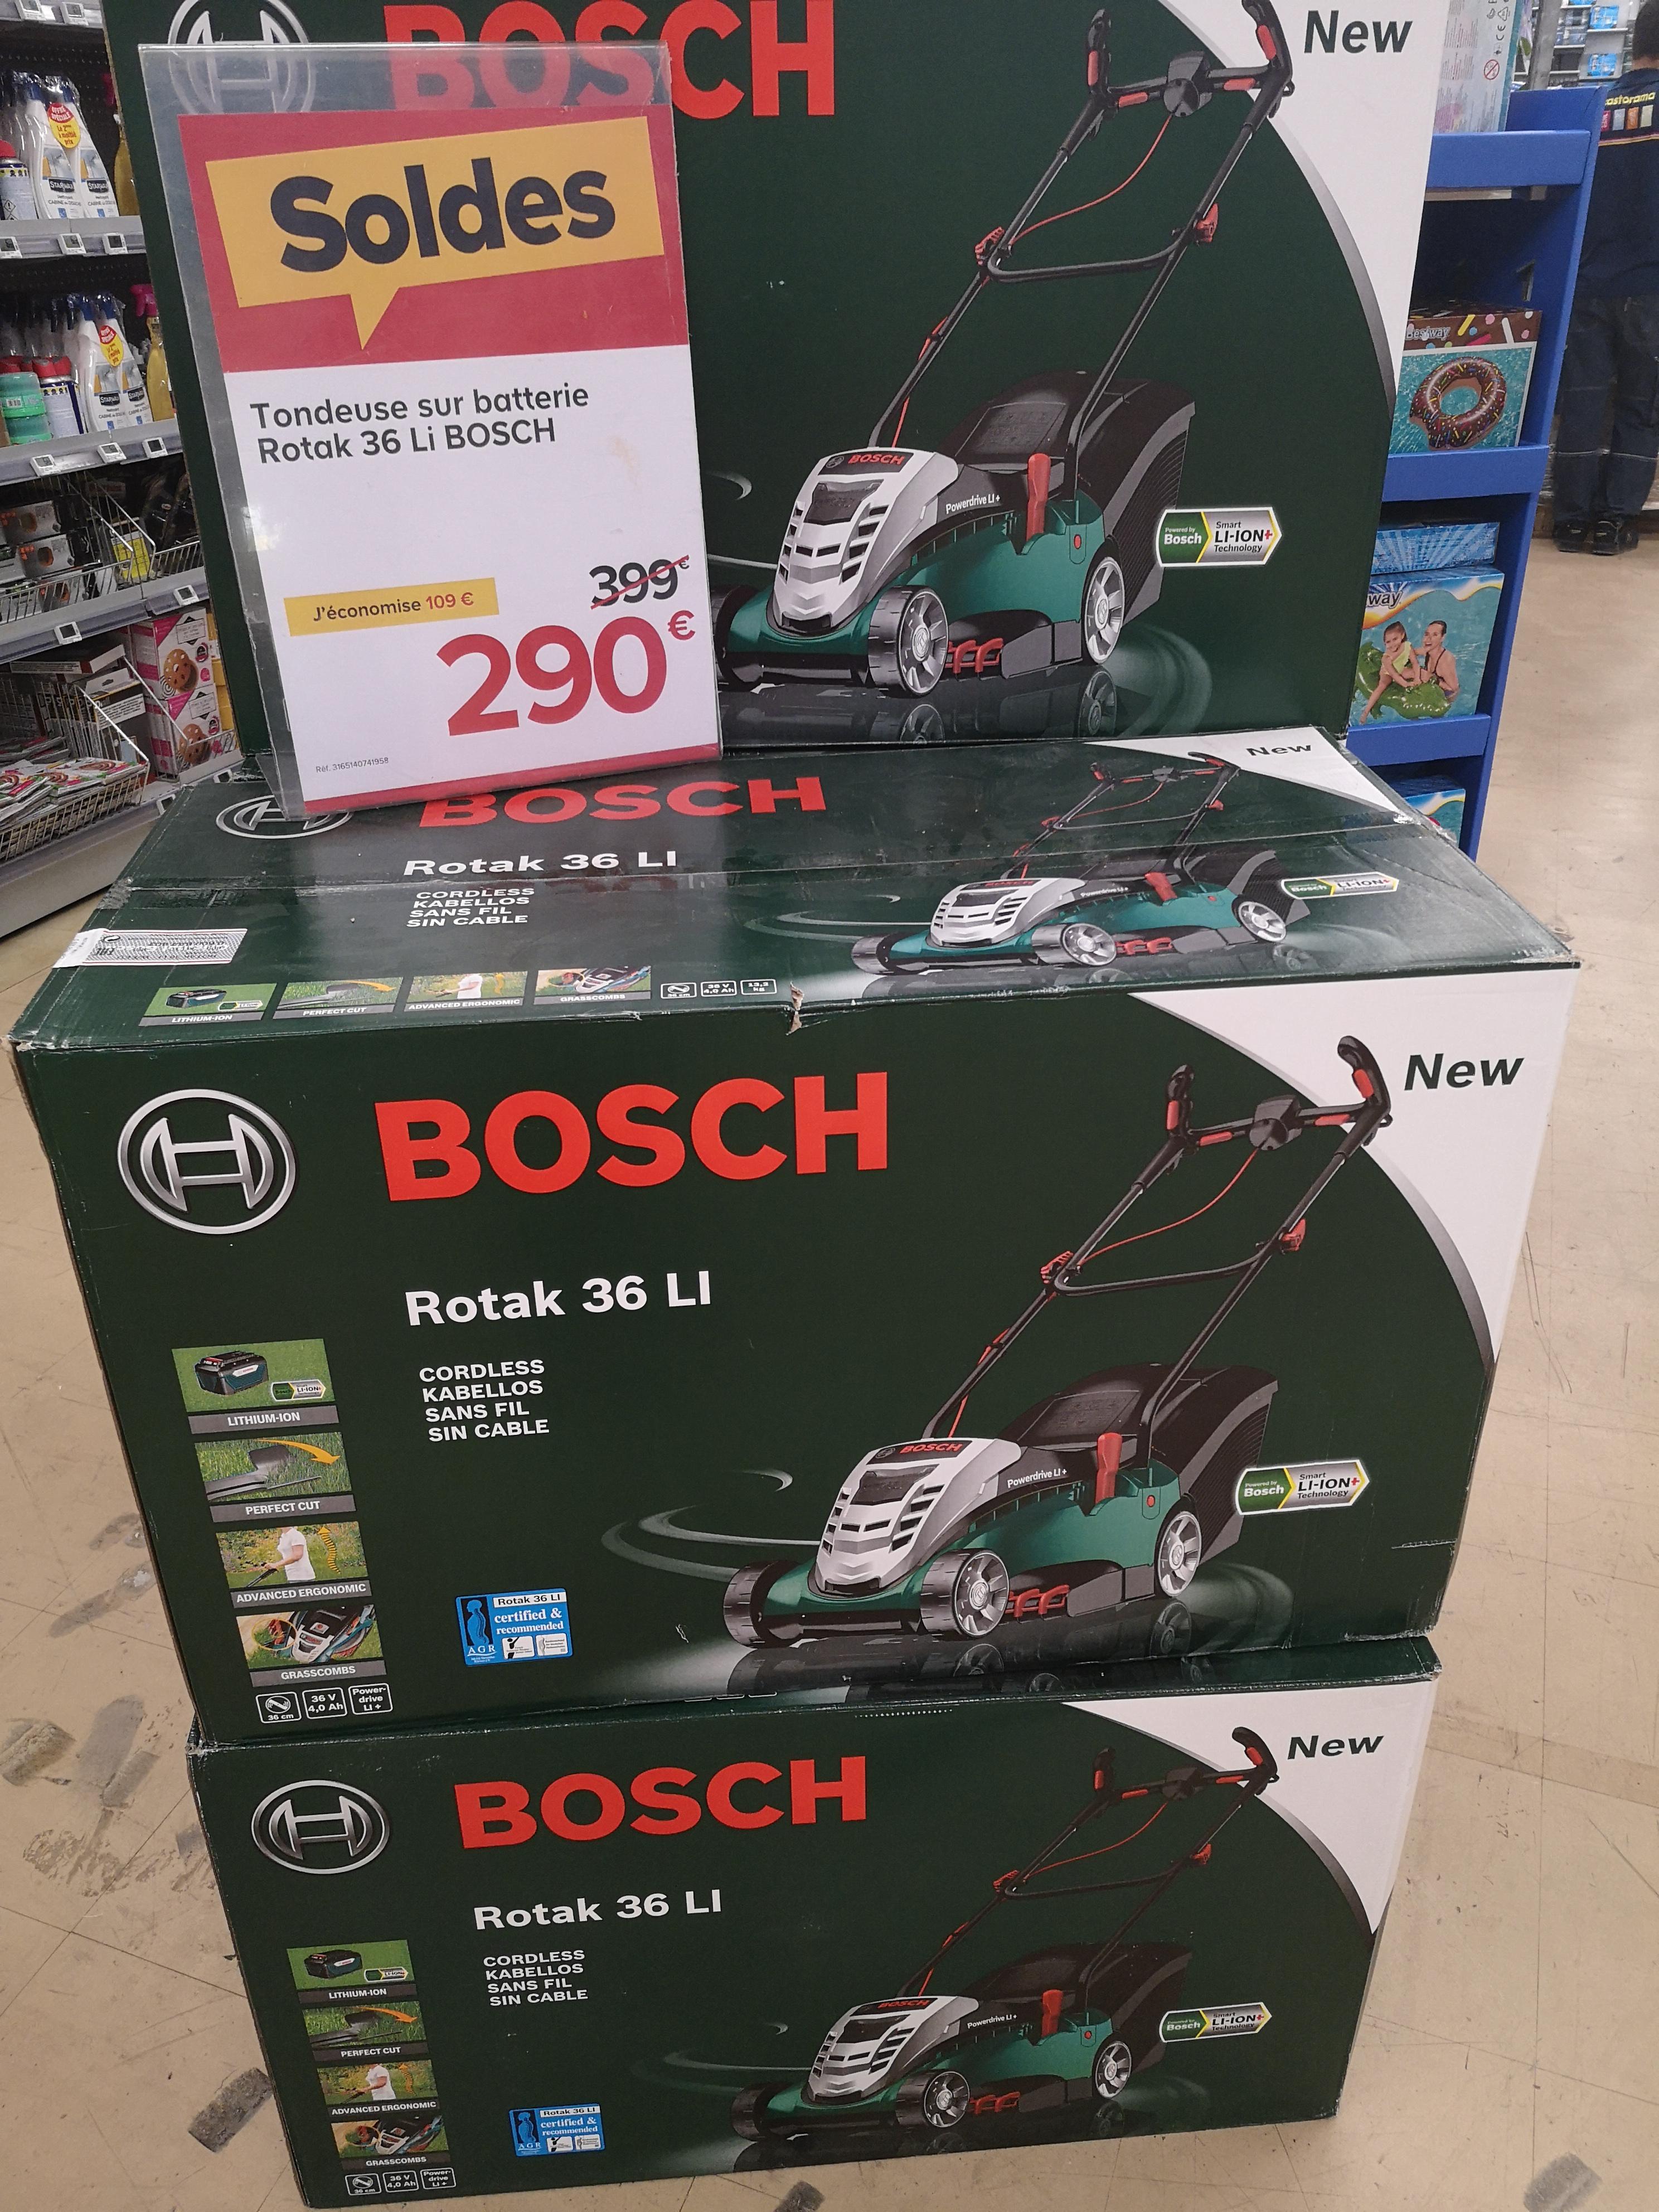 Tondeuse électrique sans-fil Bosch Rotak 36Li (36 V, 4 Ah) - Vélizy-Villacoublay (78)